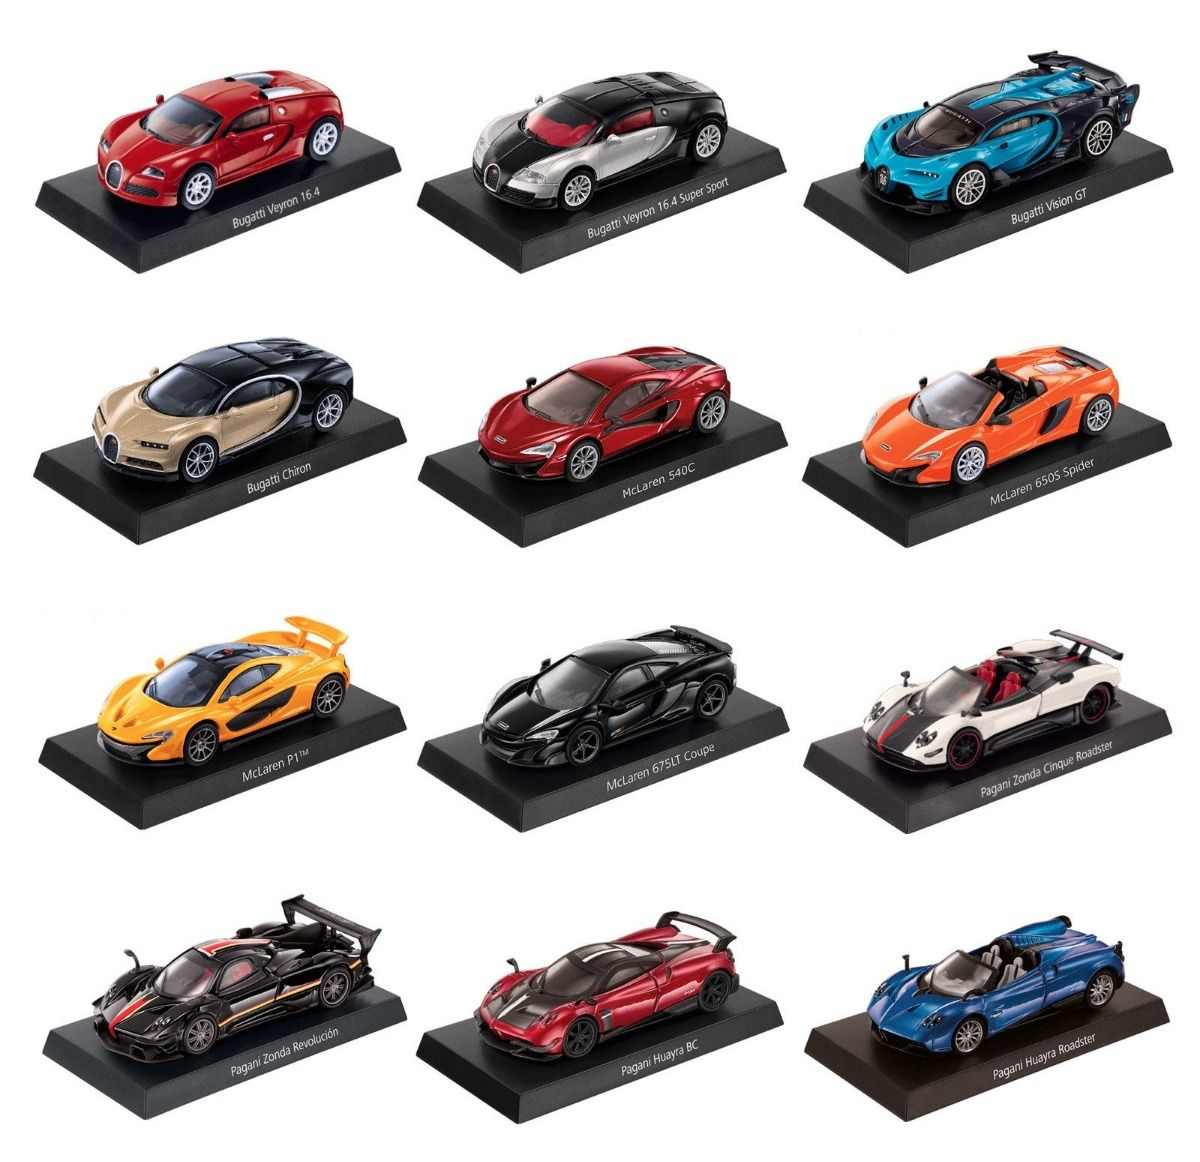 Hot Wheels Bugatti Google Search Bugatti Diecast Cars Pagani